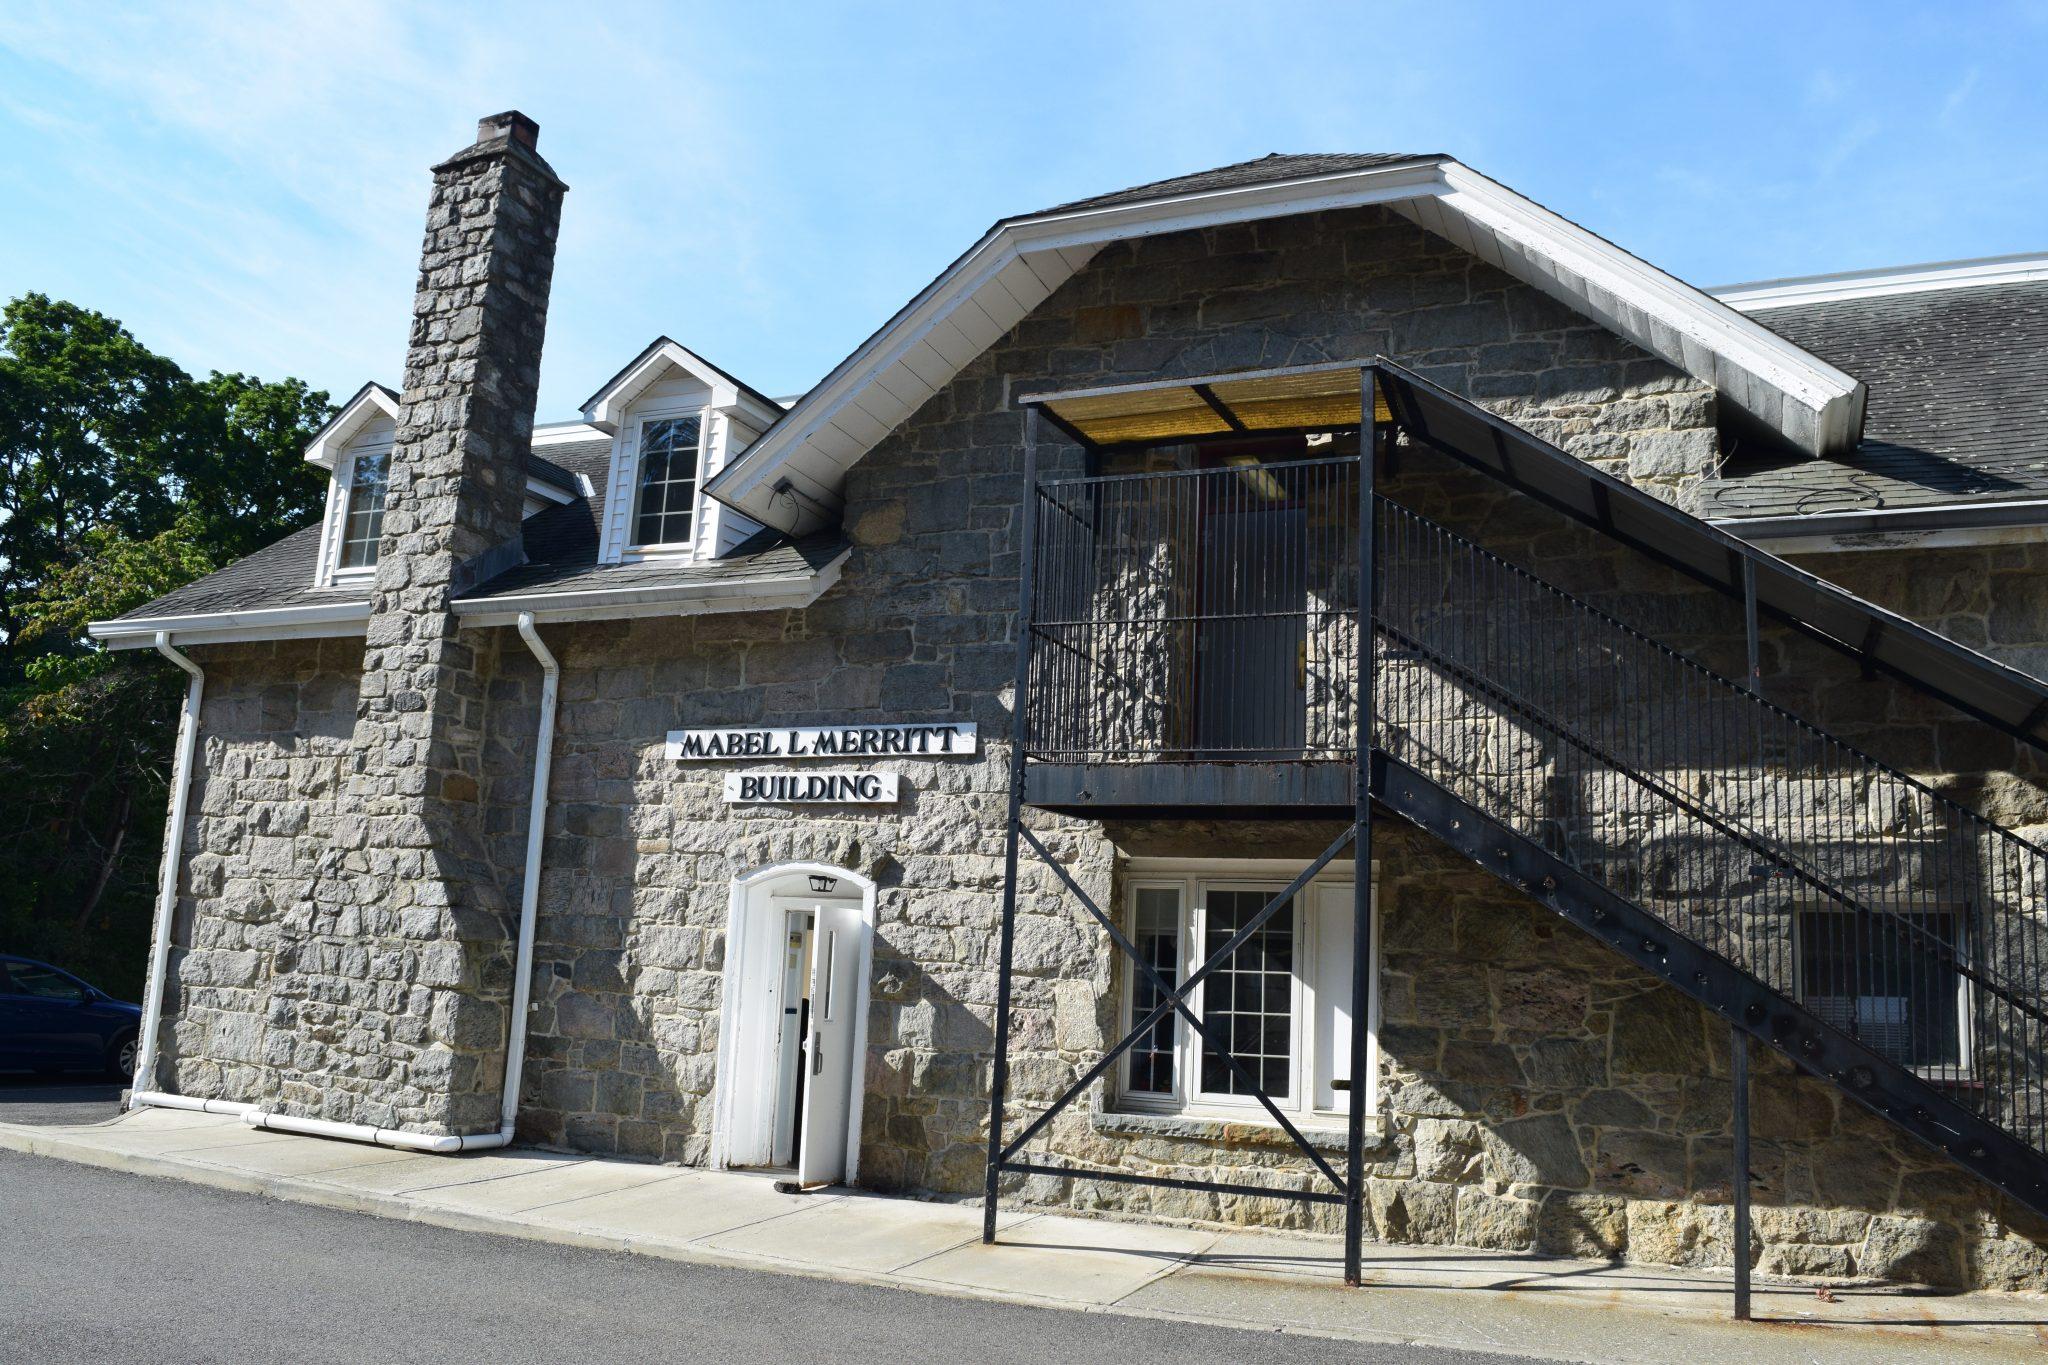 Mabel Merritt Building